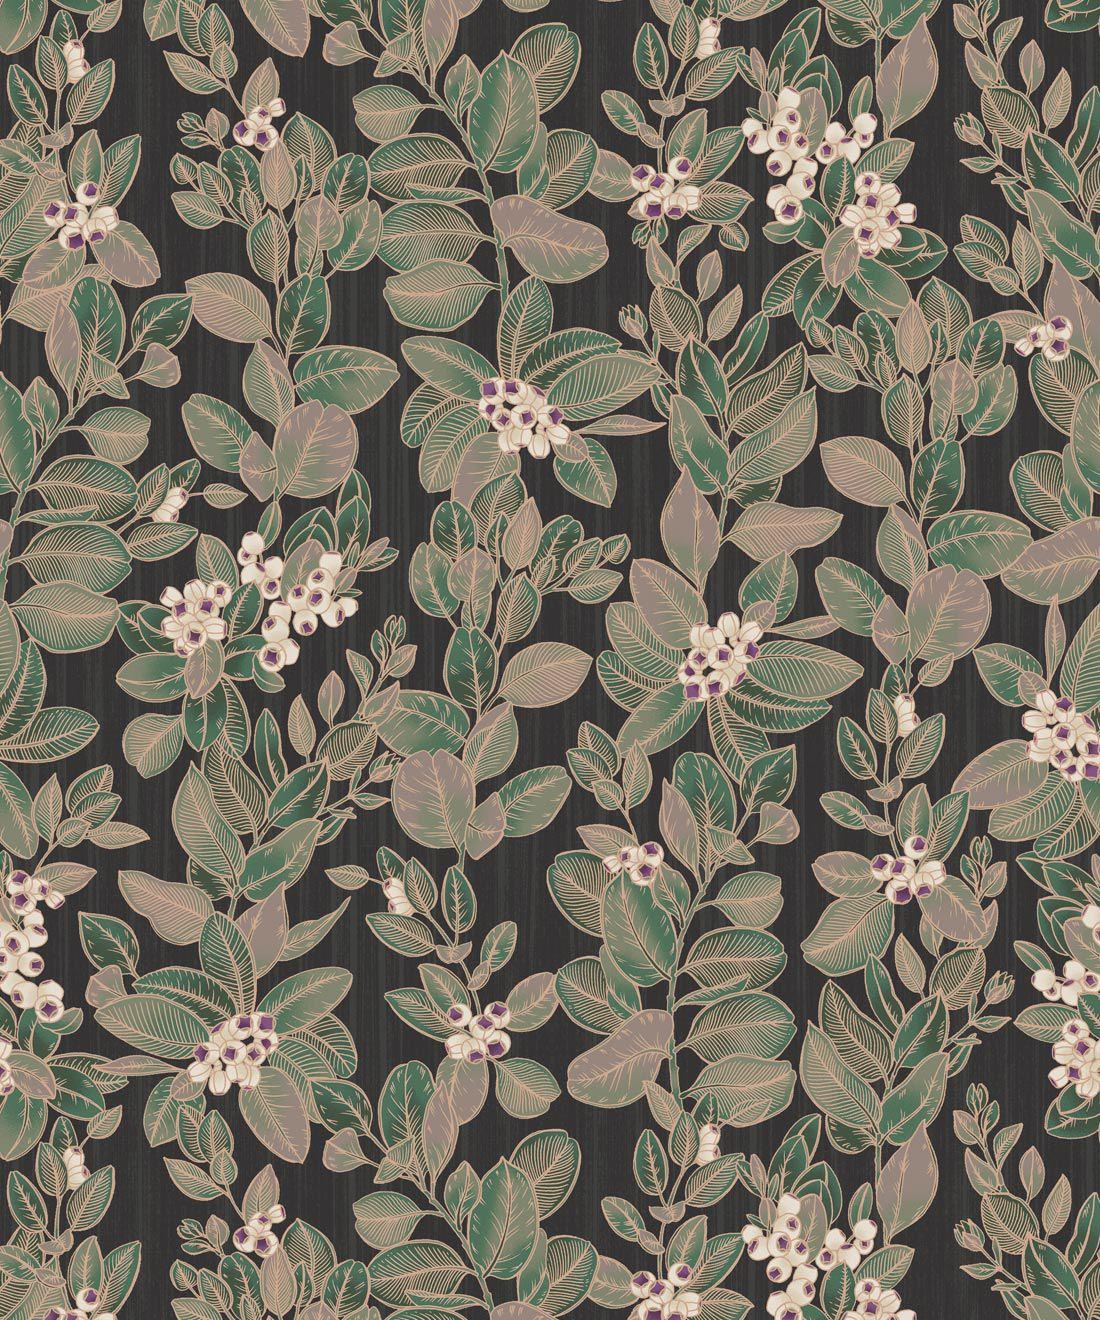 Eucalyptus Wallpaper • Eloise Short • Vintage Floral Wallpaper •Granny Chic Wallpaper • Grandmillennial Style Wallpaper •Pebble •Swatch